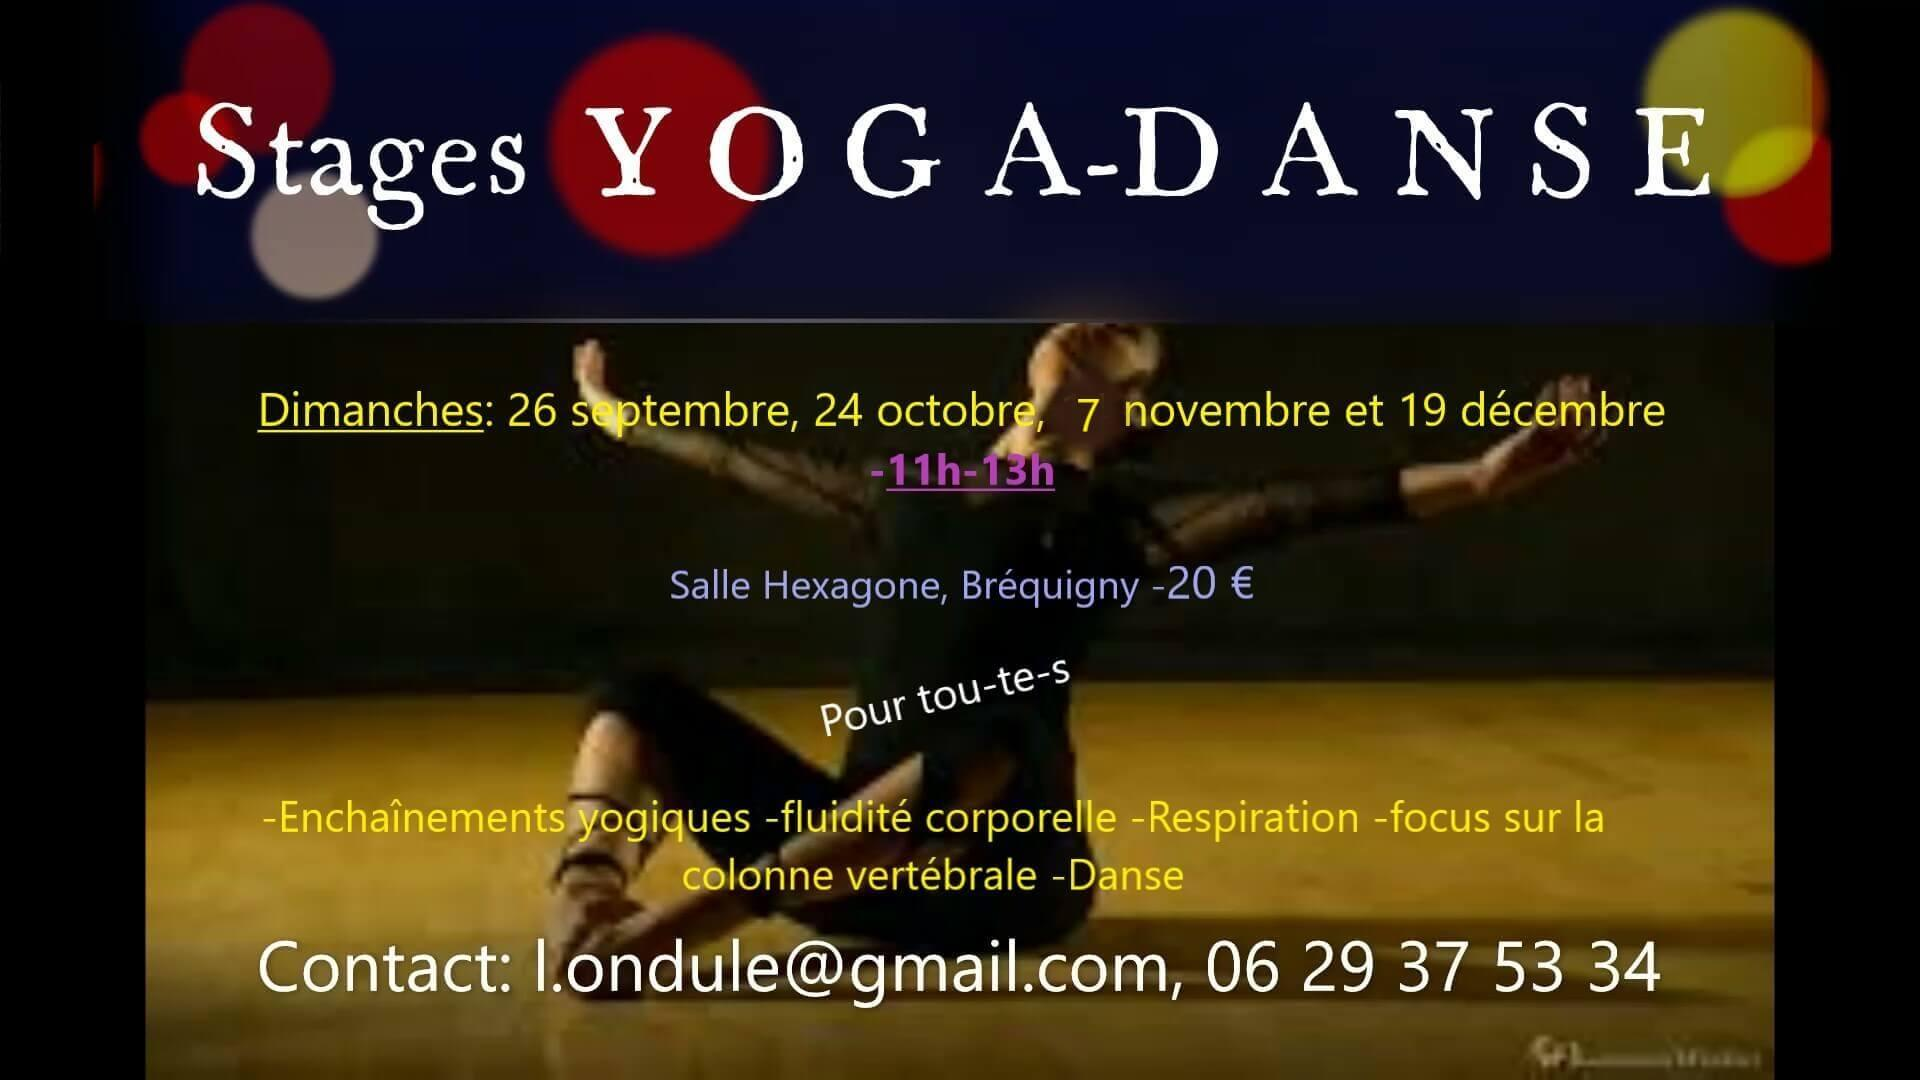 Yoga danse stage